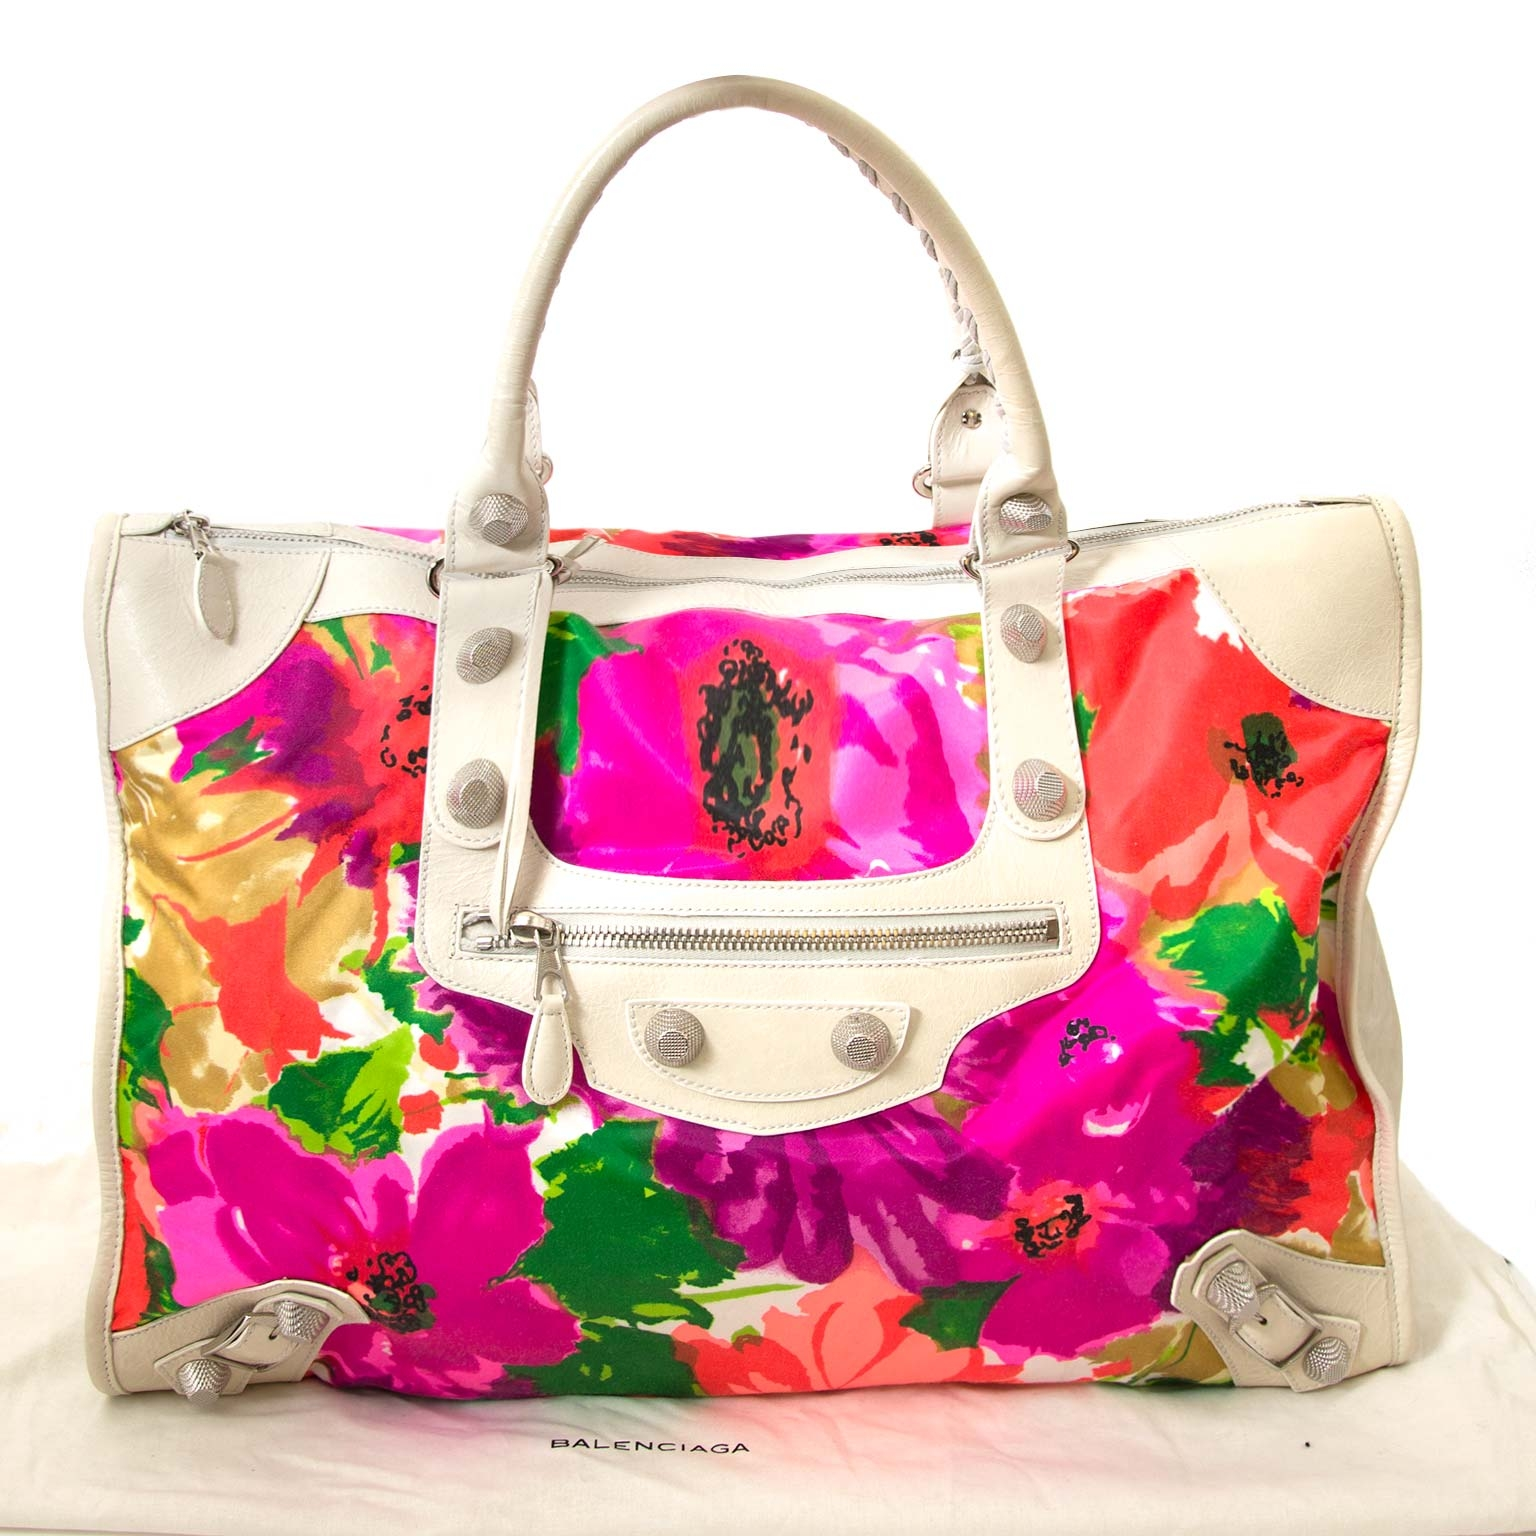 koop balenciaga giant 21 extra-large bloemen city tas bij labellov vintage mode webshop